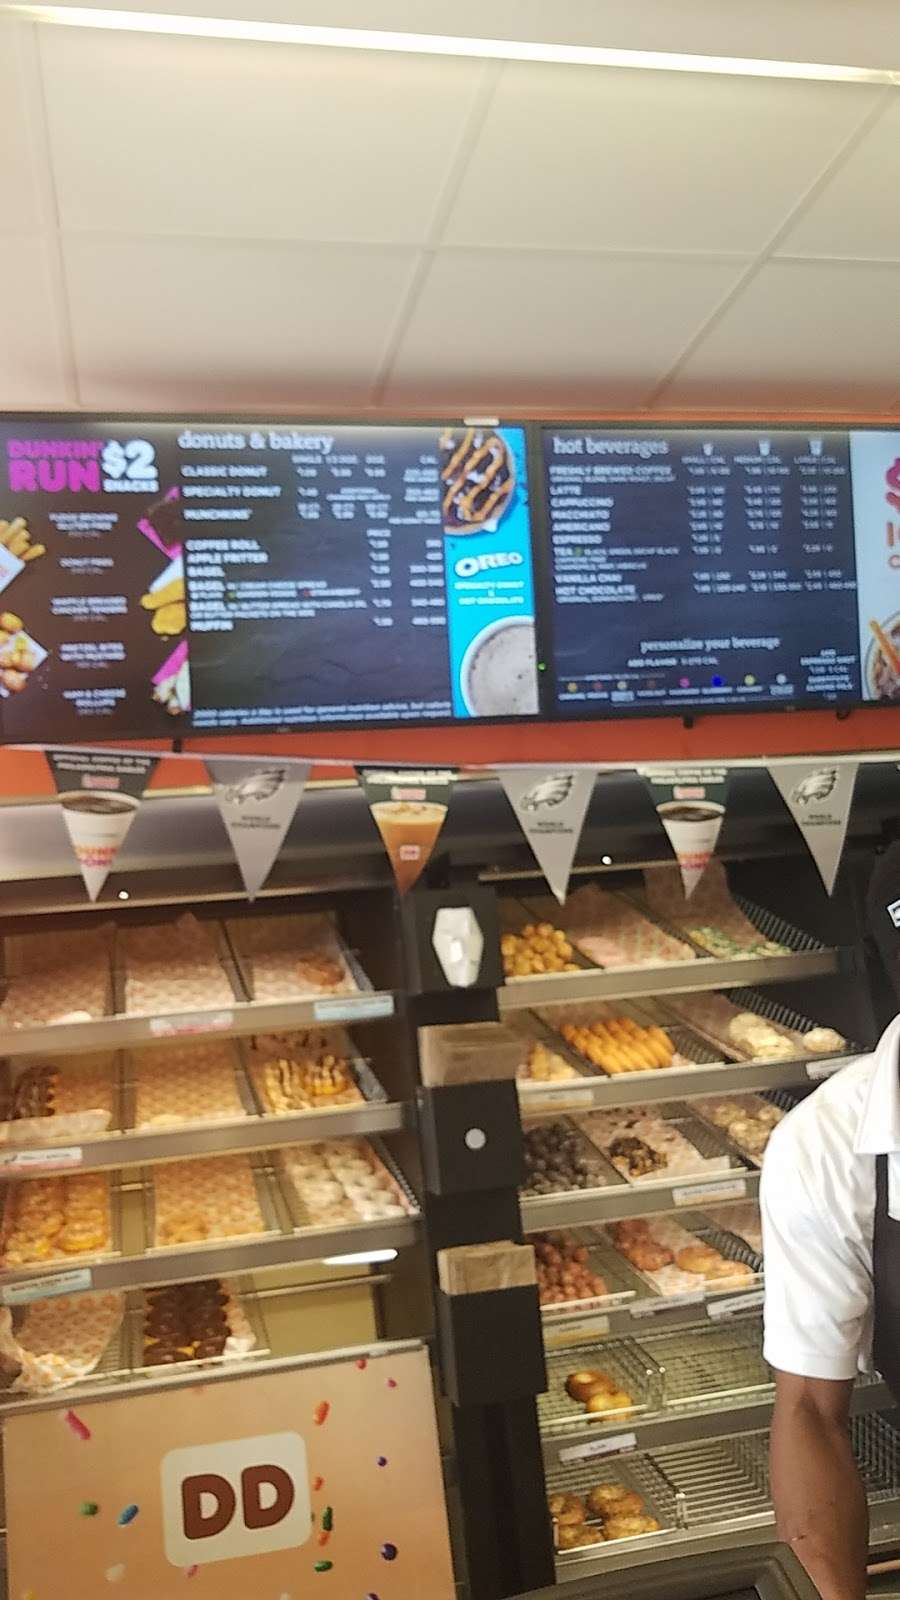 Dunkin Donuts - cafe    Photo 10 of 10   Address: 296 White Horse Pike, Atco, NJ 08004, USA   Phone: (856) 768-2233